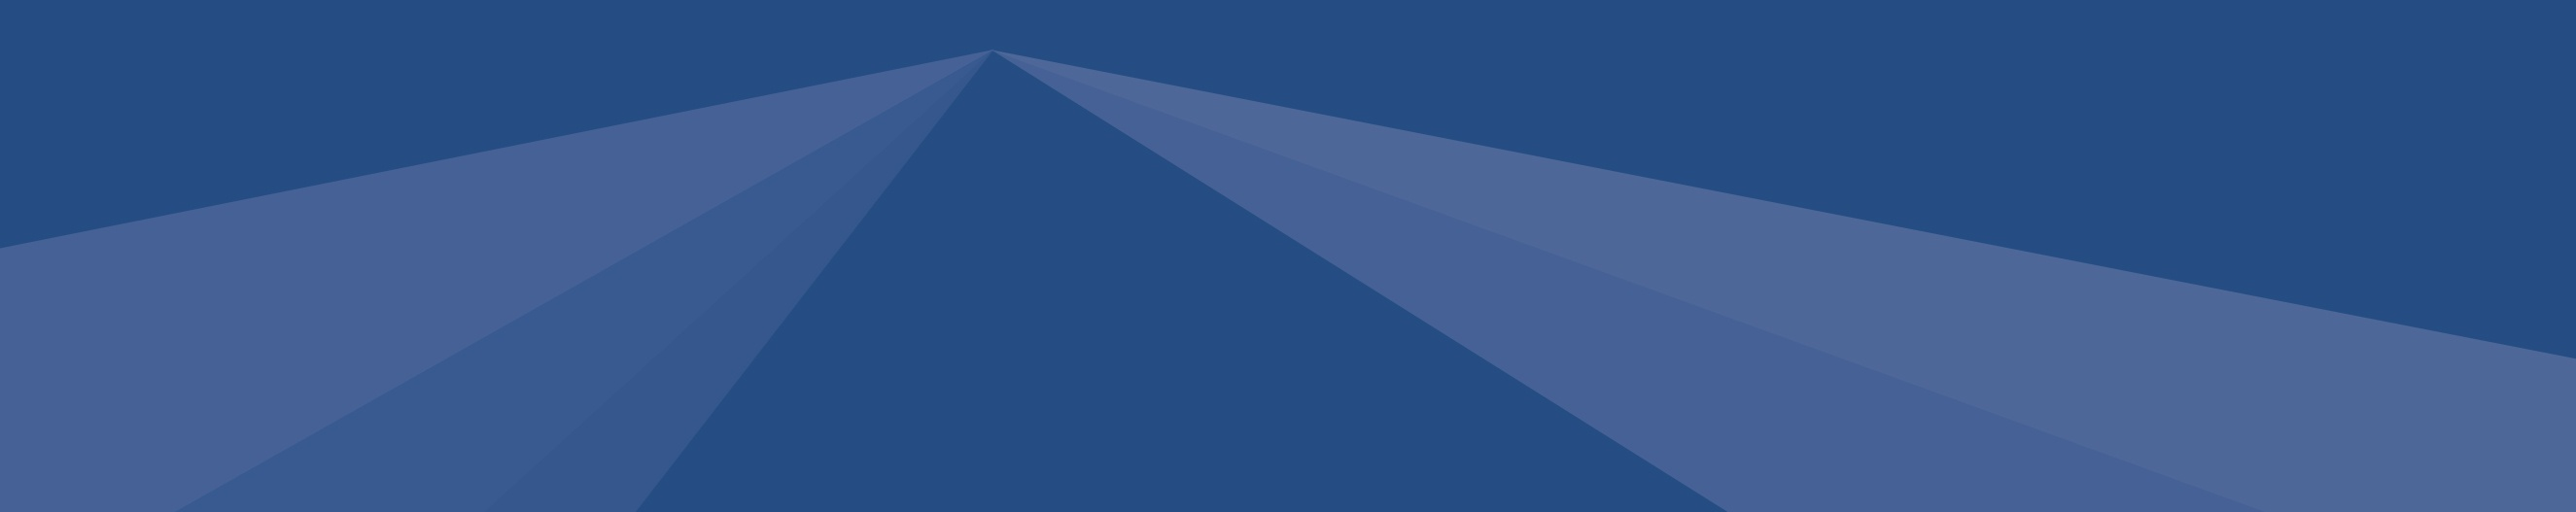 EM03 EMEA Policy Admin Systems 2017 Banner